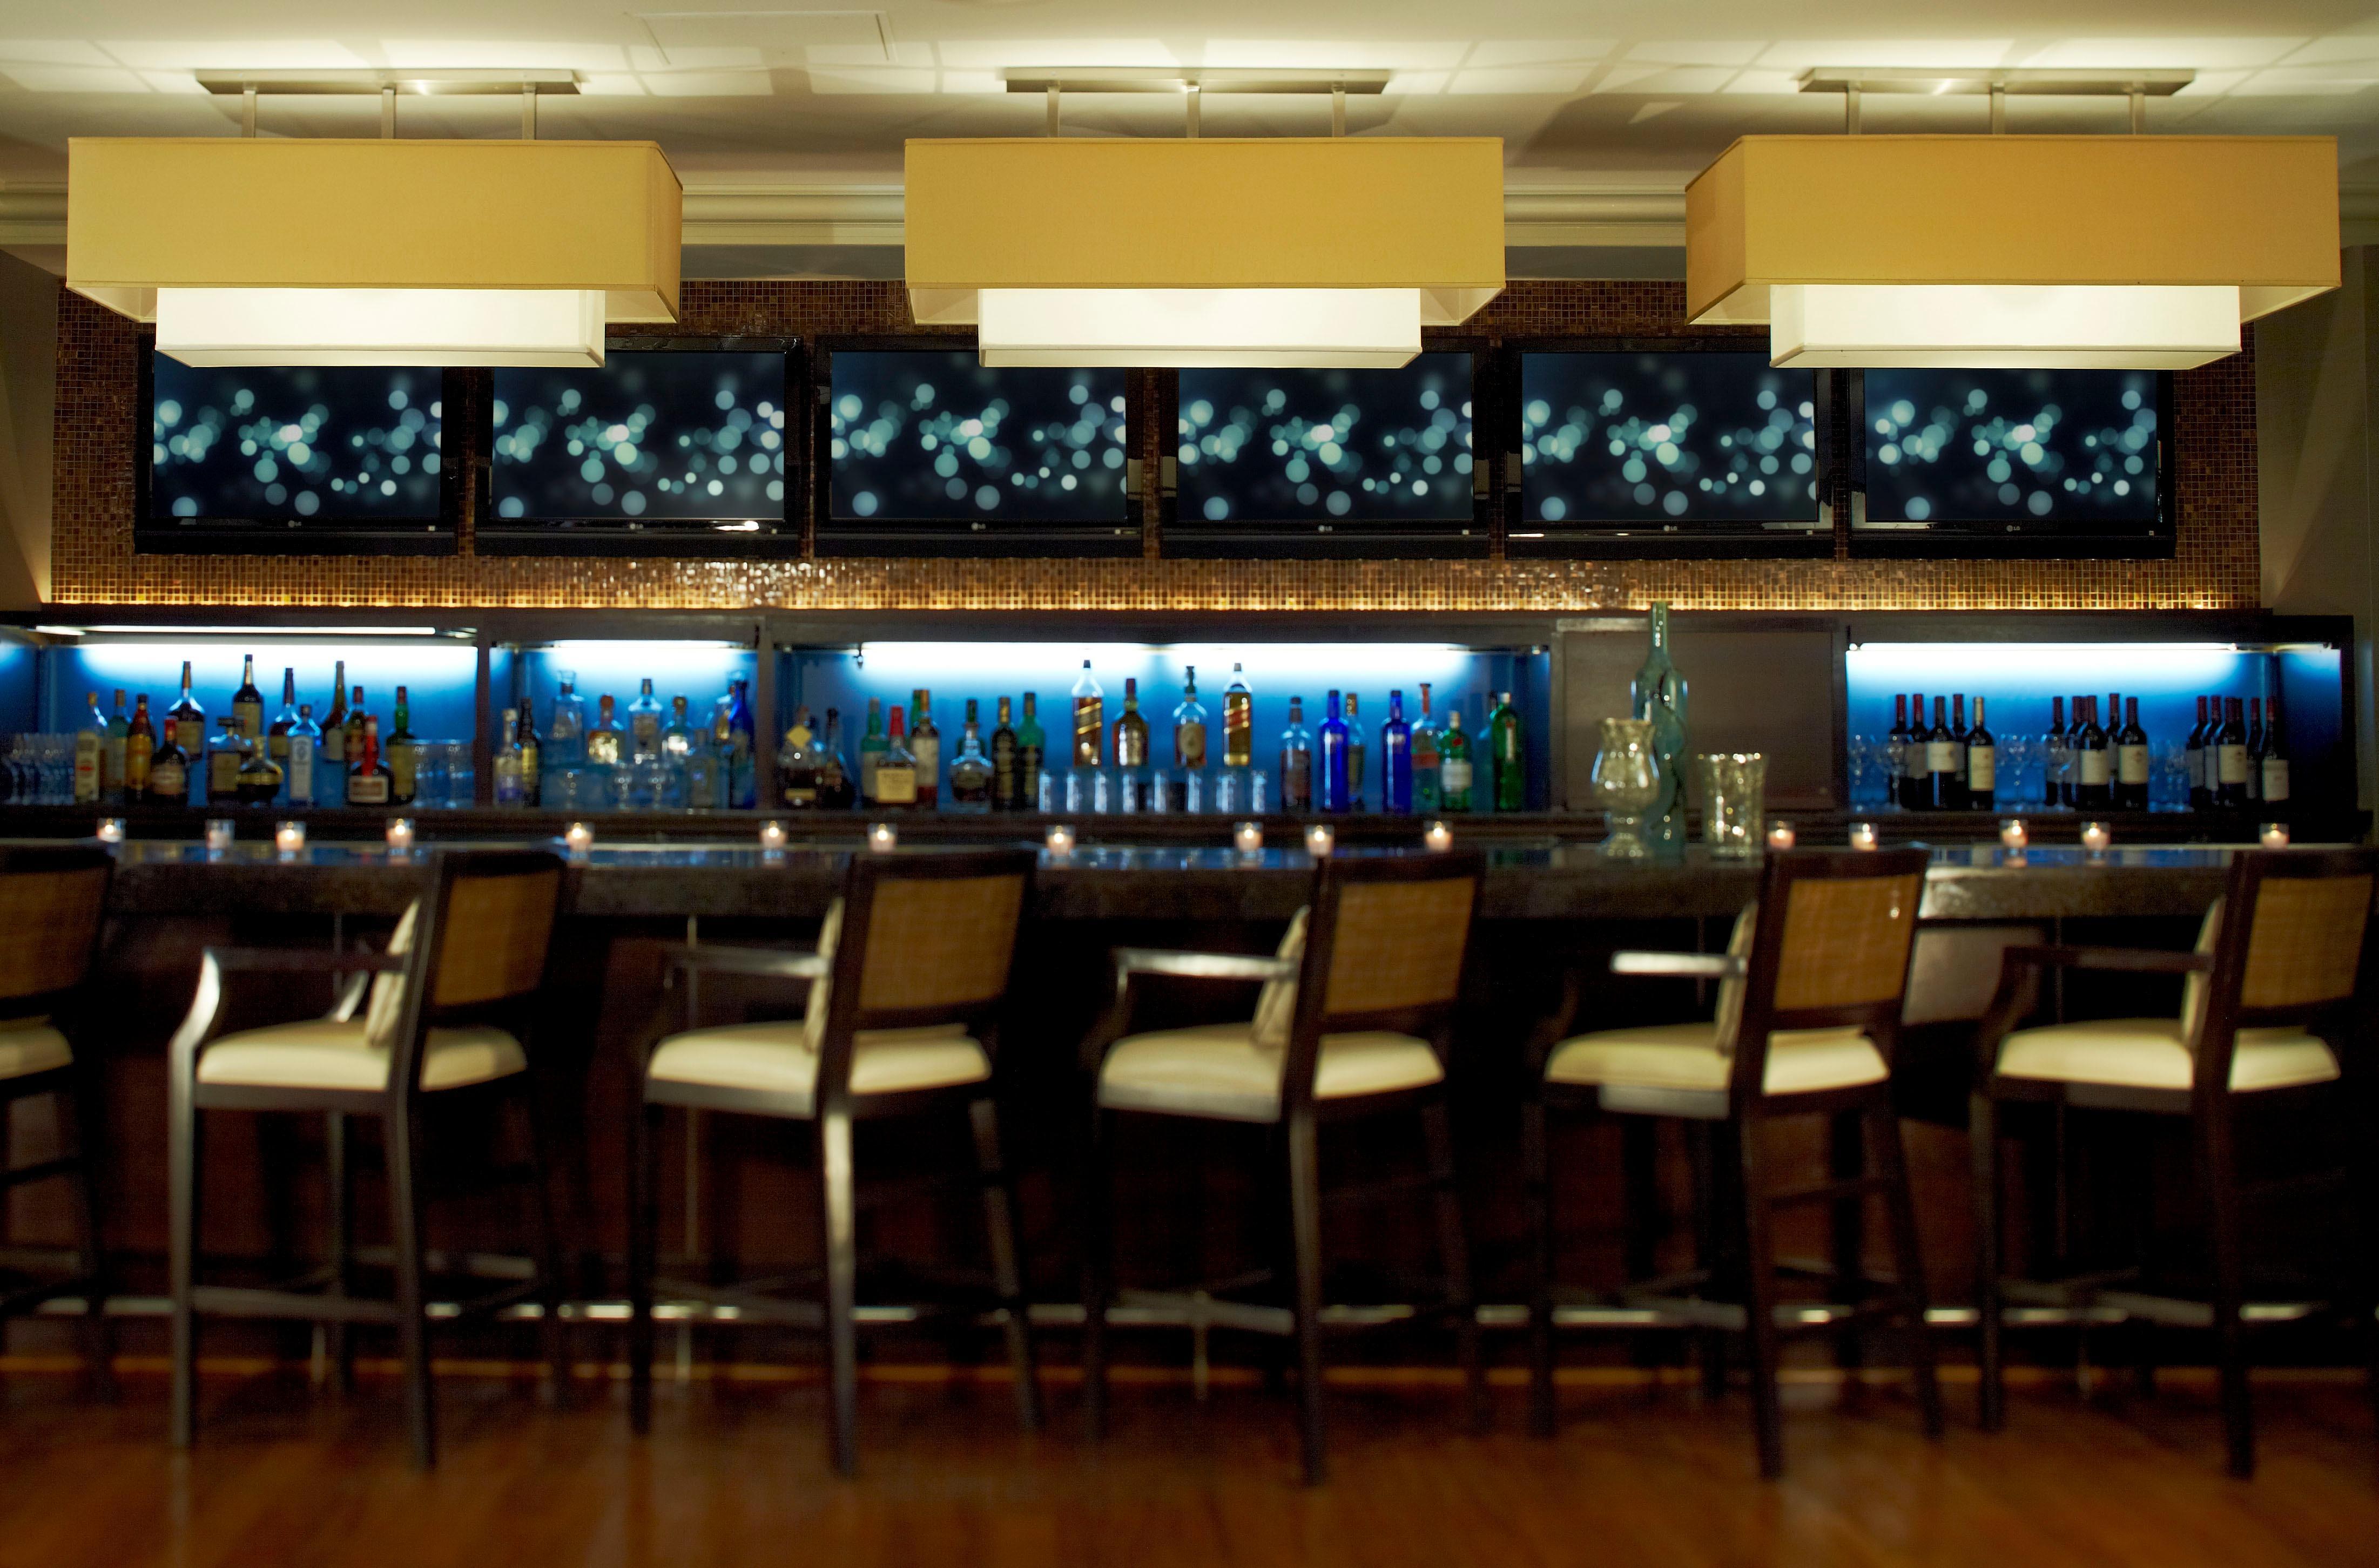 Renaissance Fort Lauderdale Cruise Port Hotel image 3